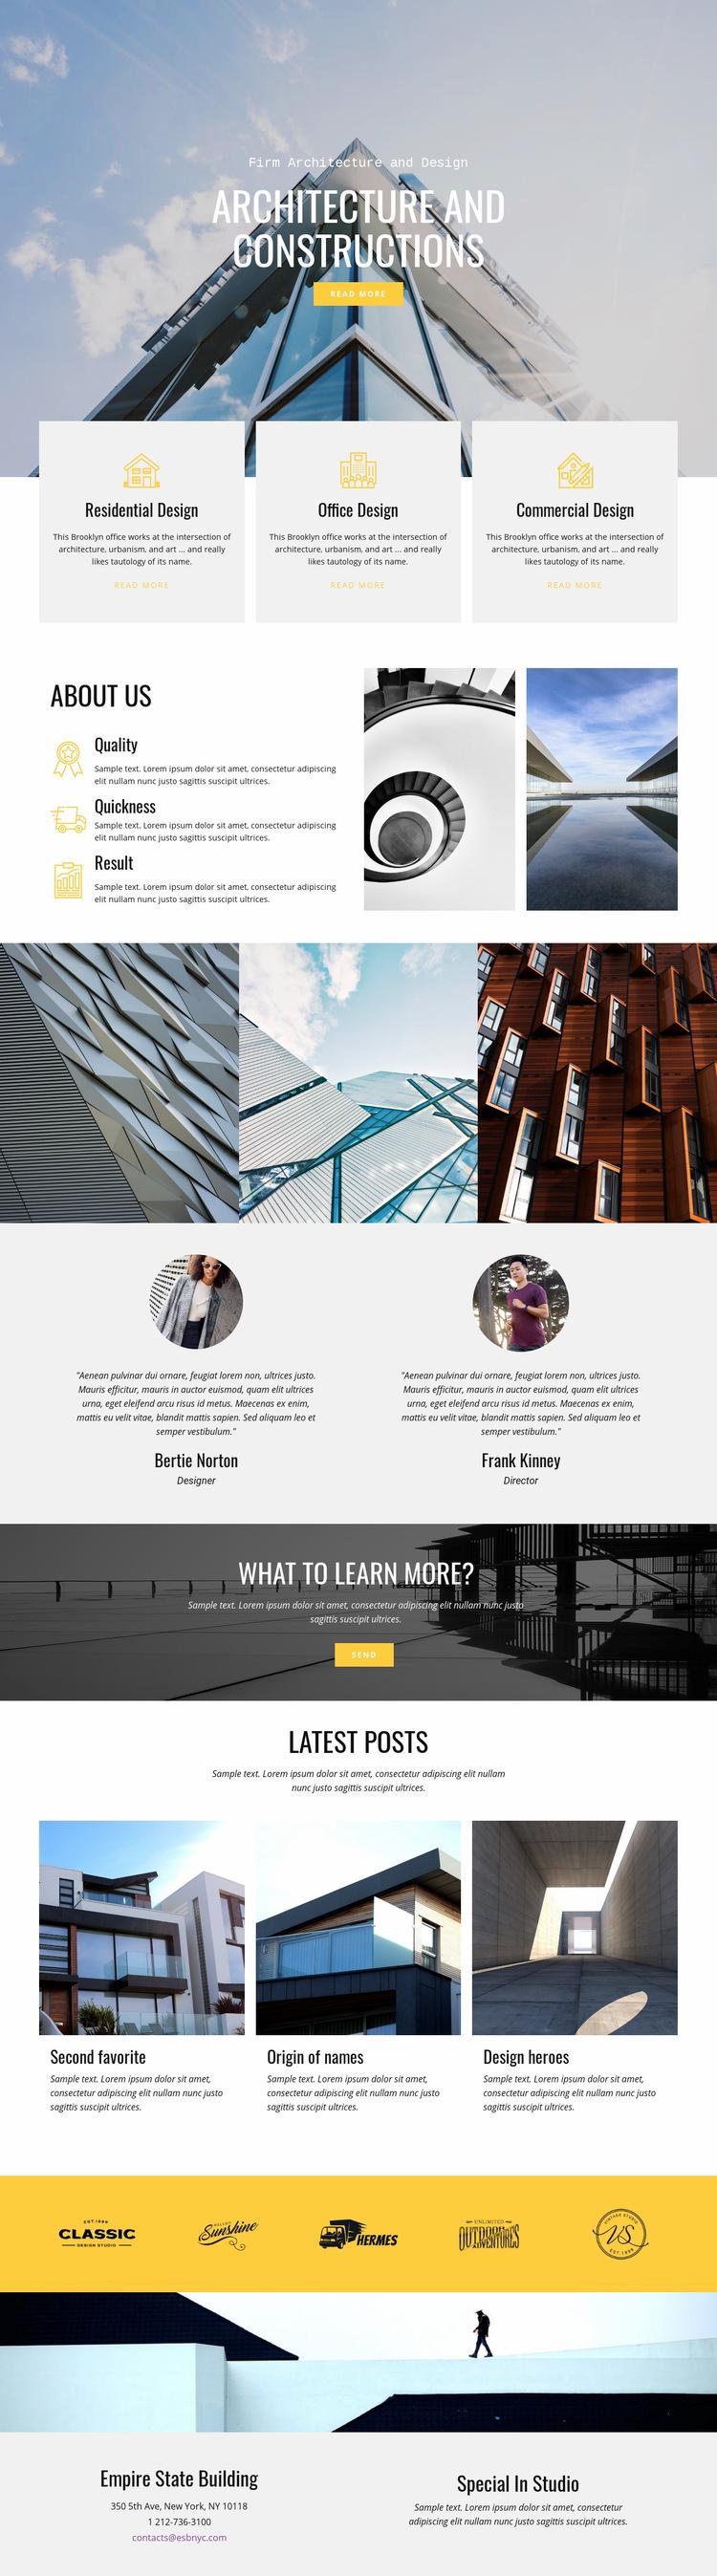 Constructive architecture Web Page Design